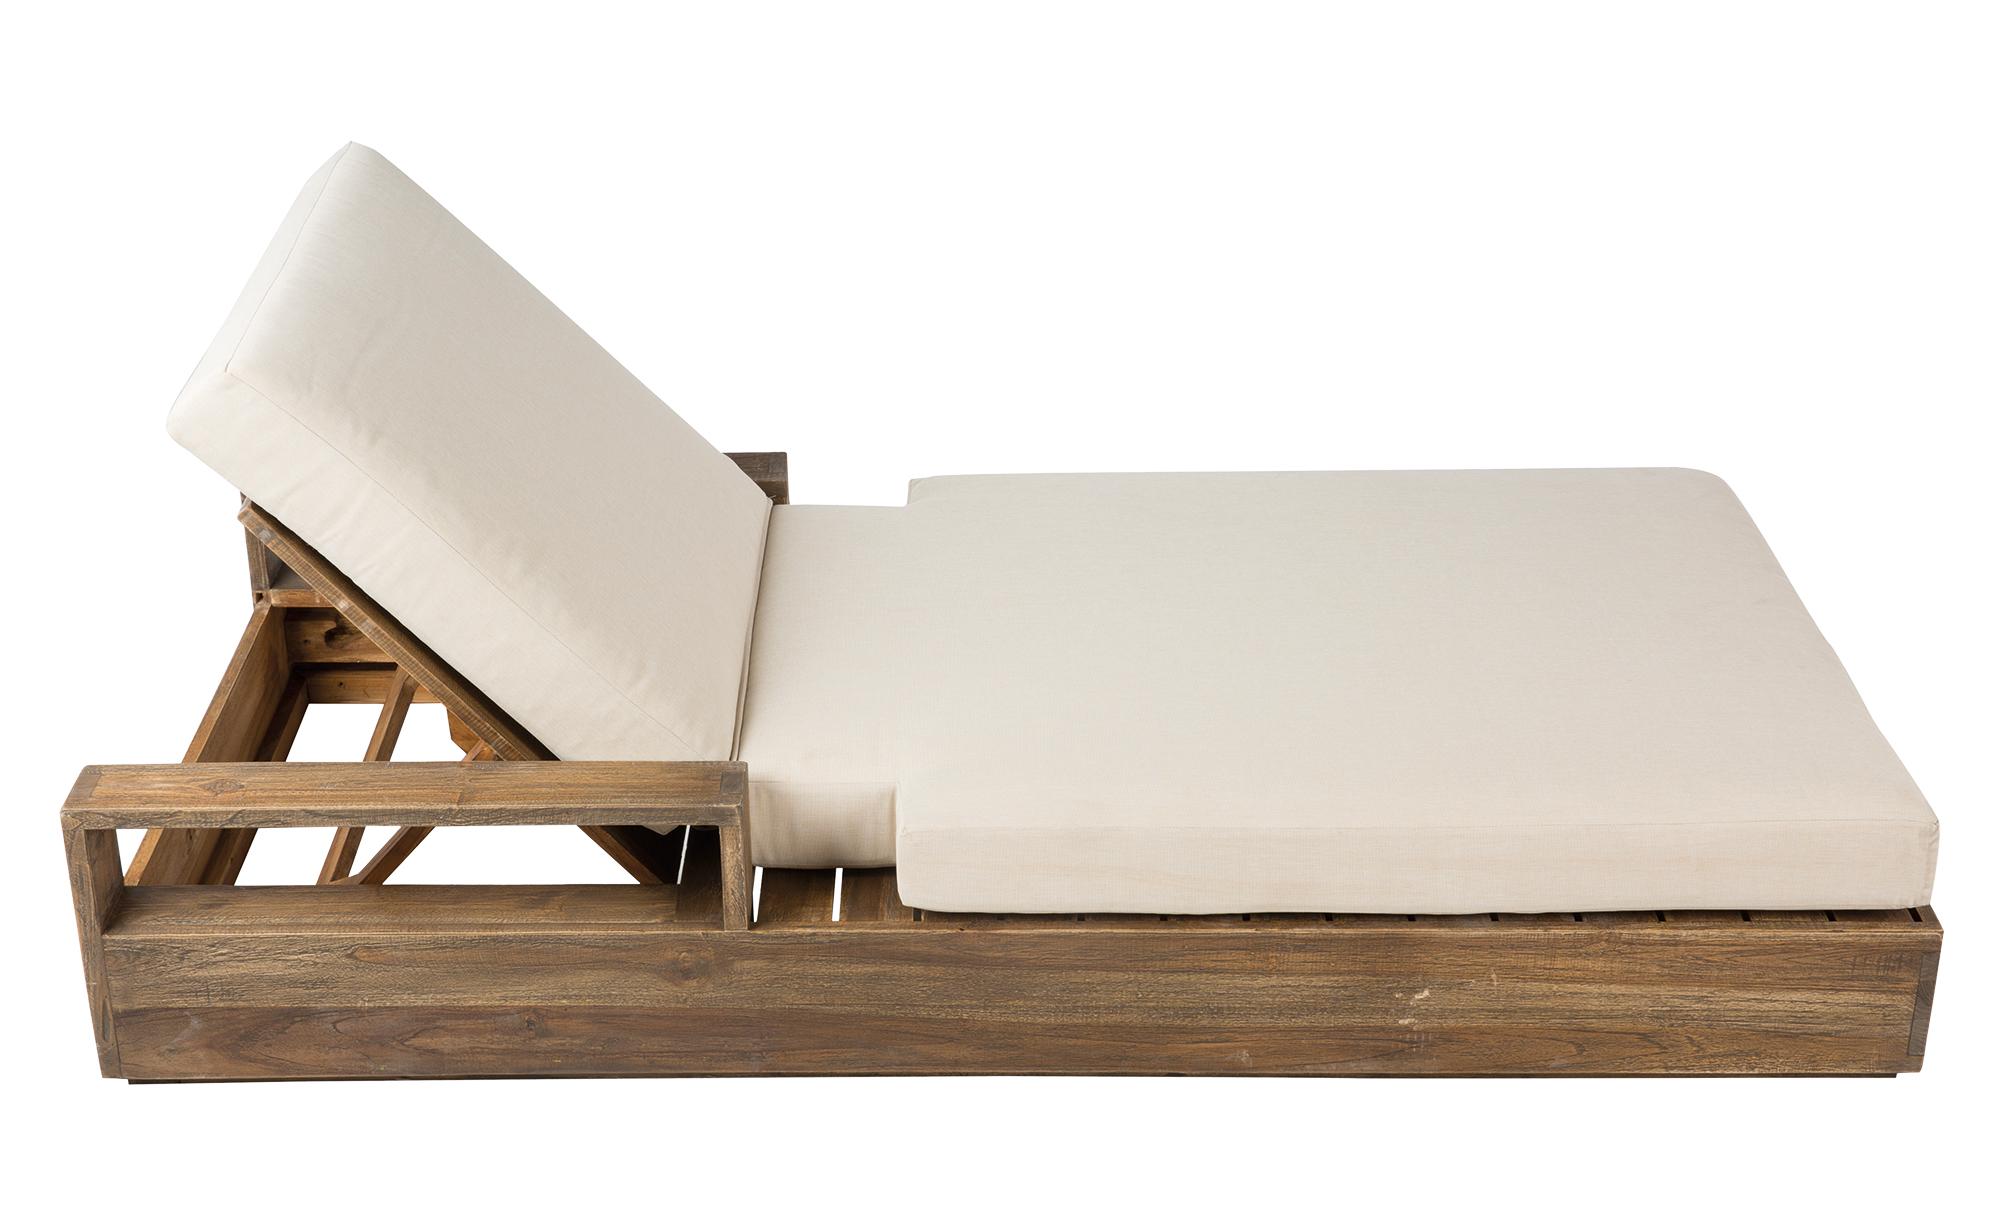 tumbona de madera con colchoneta blanca - Tumbonas De Madera